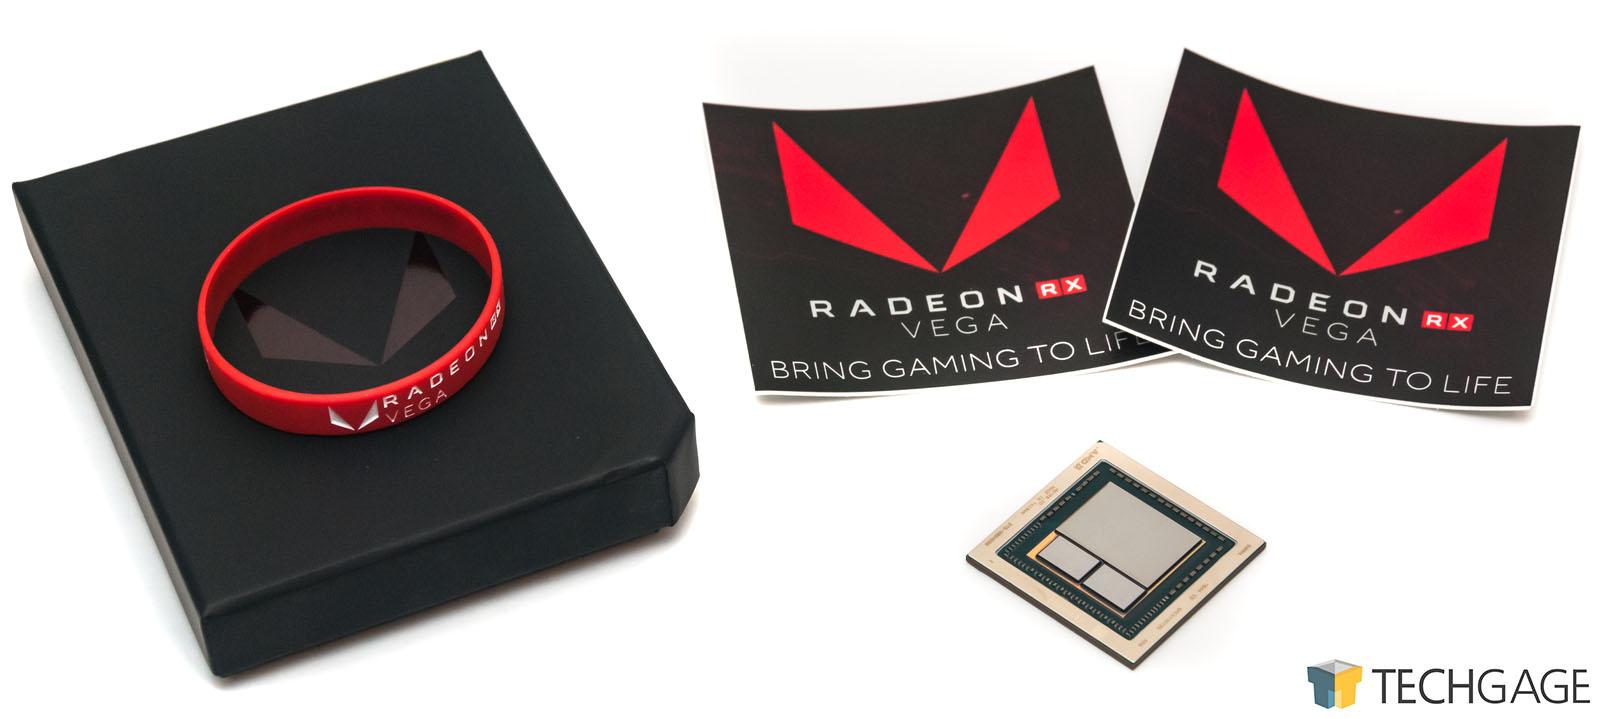 AMD-Radeon-RX-Vega-64-Special-Box